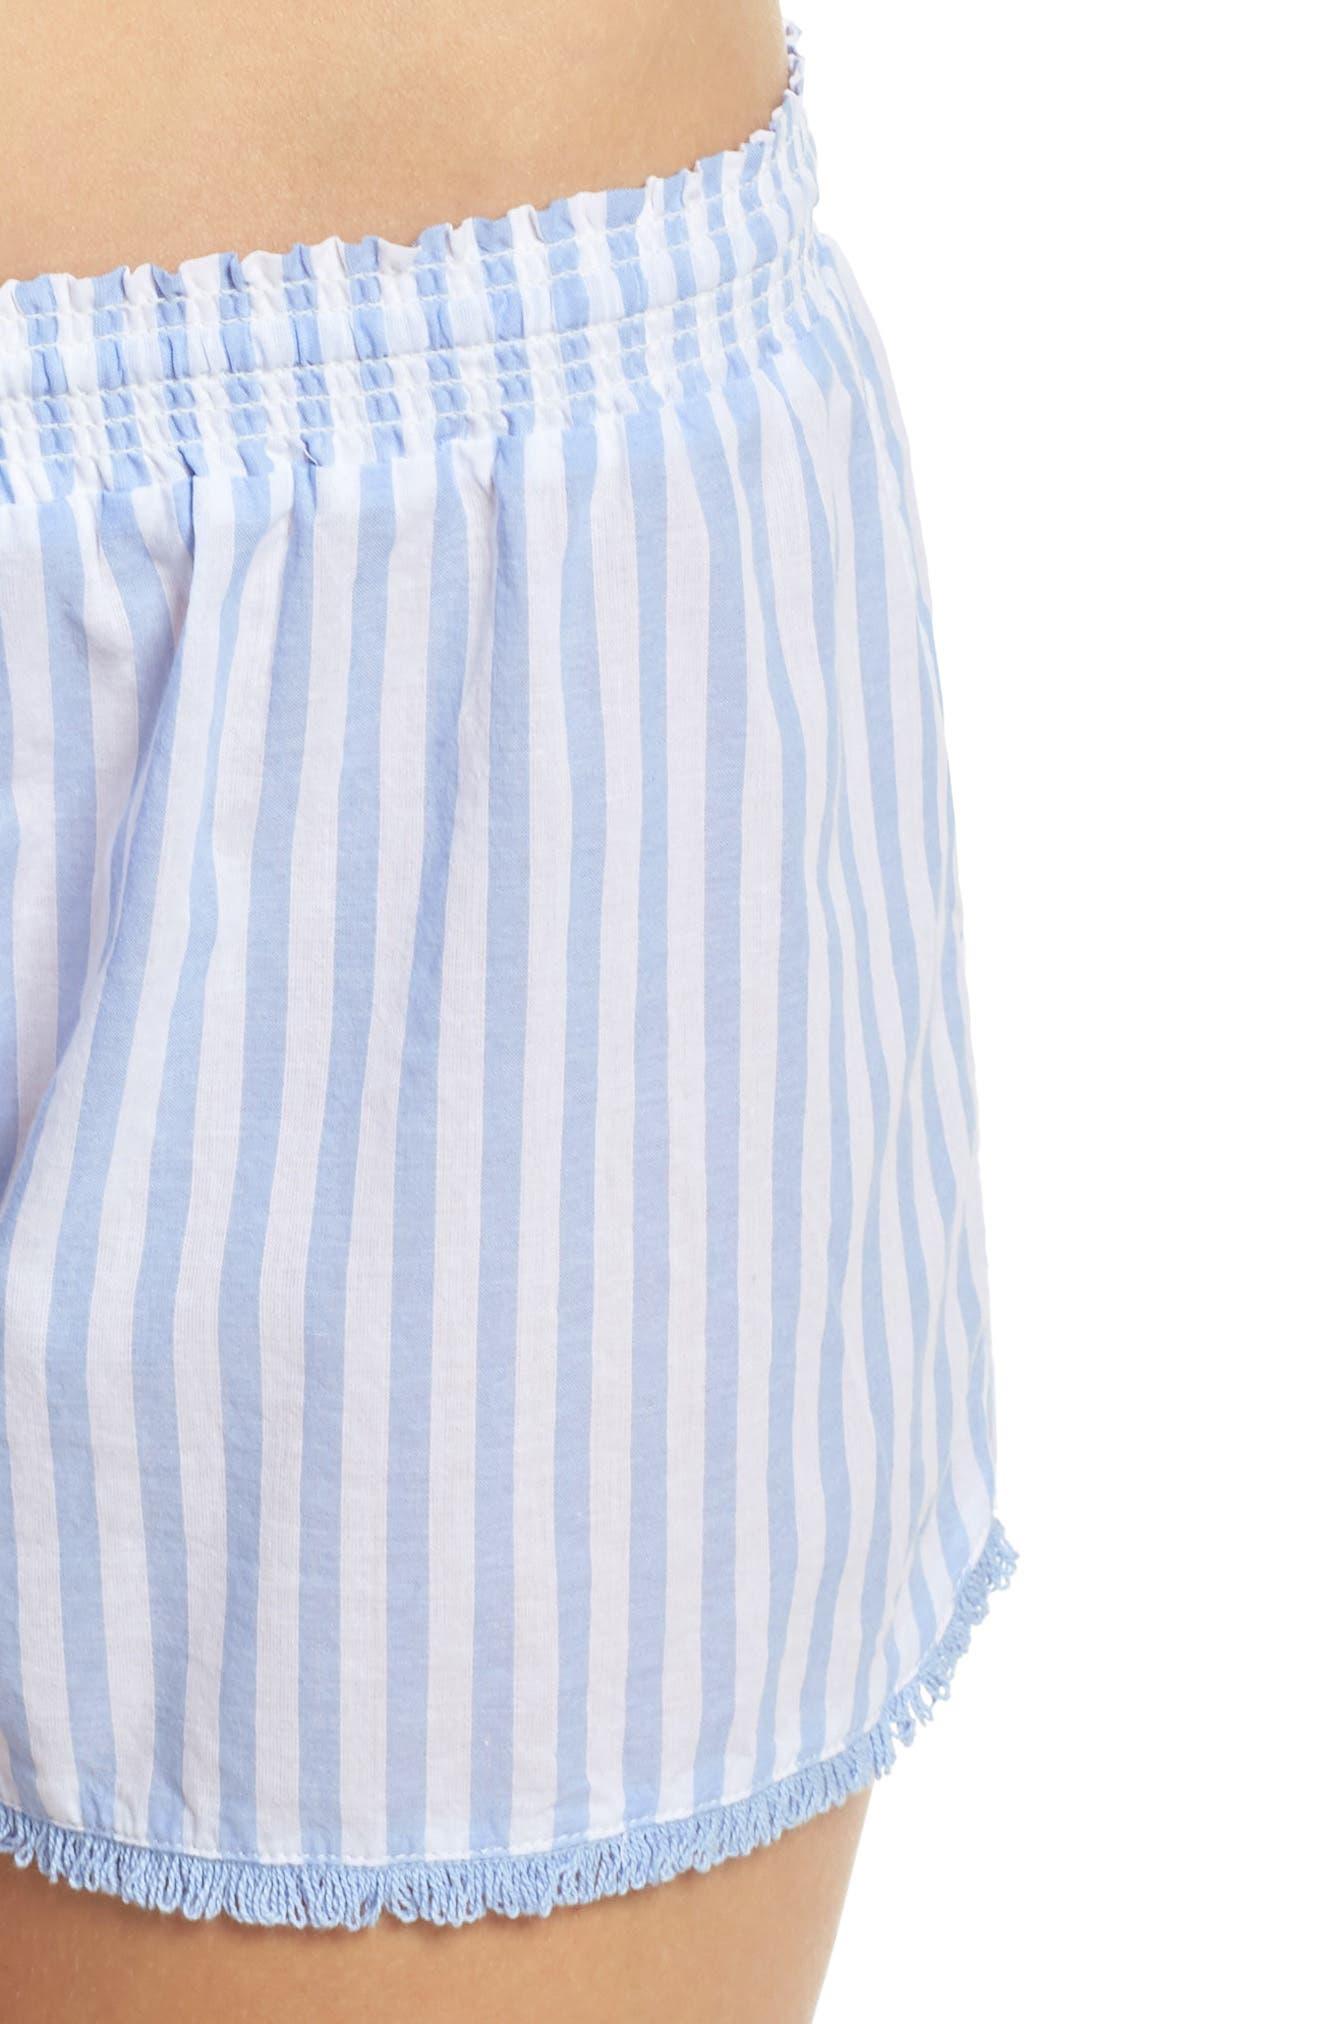 Stripe Short Pajamas,                             Alternate thumbnail 4, color,                             100